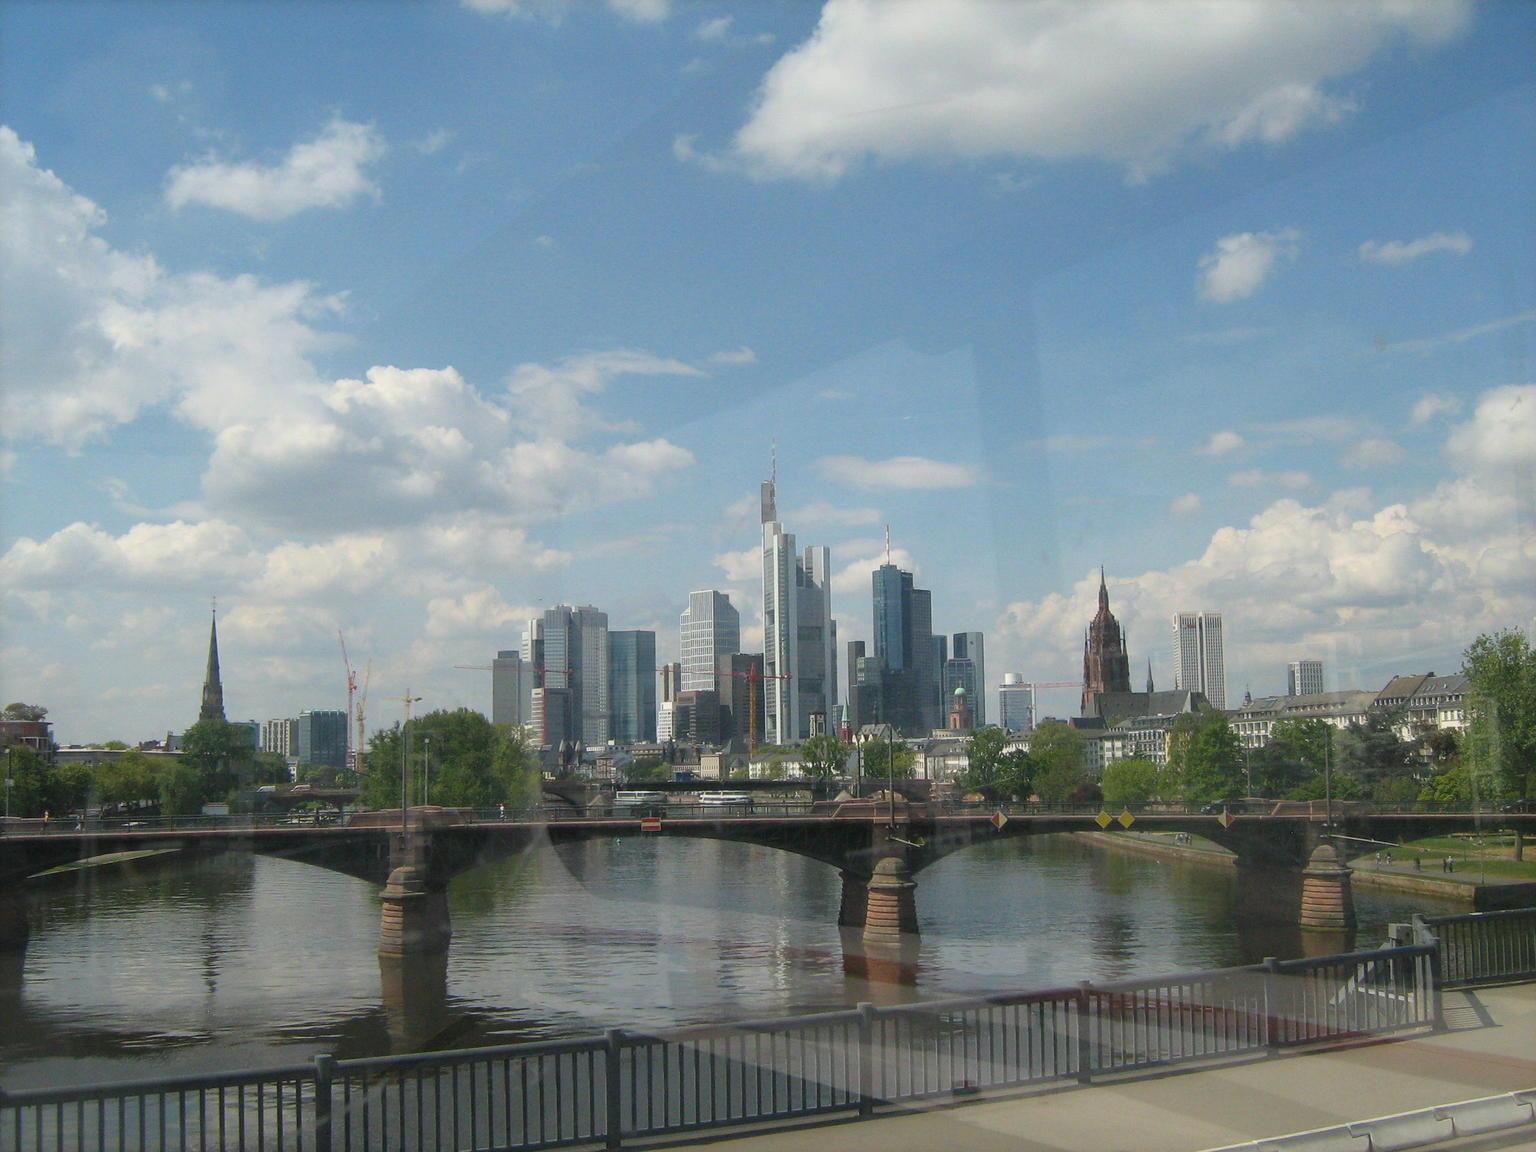 MORE PHOTOS, 2-Hour Frankfurt City Tour by Open-Top Bus